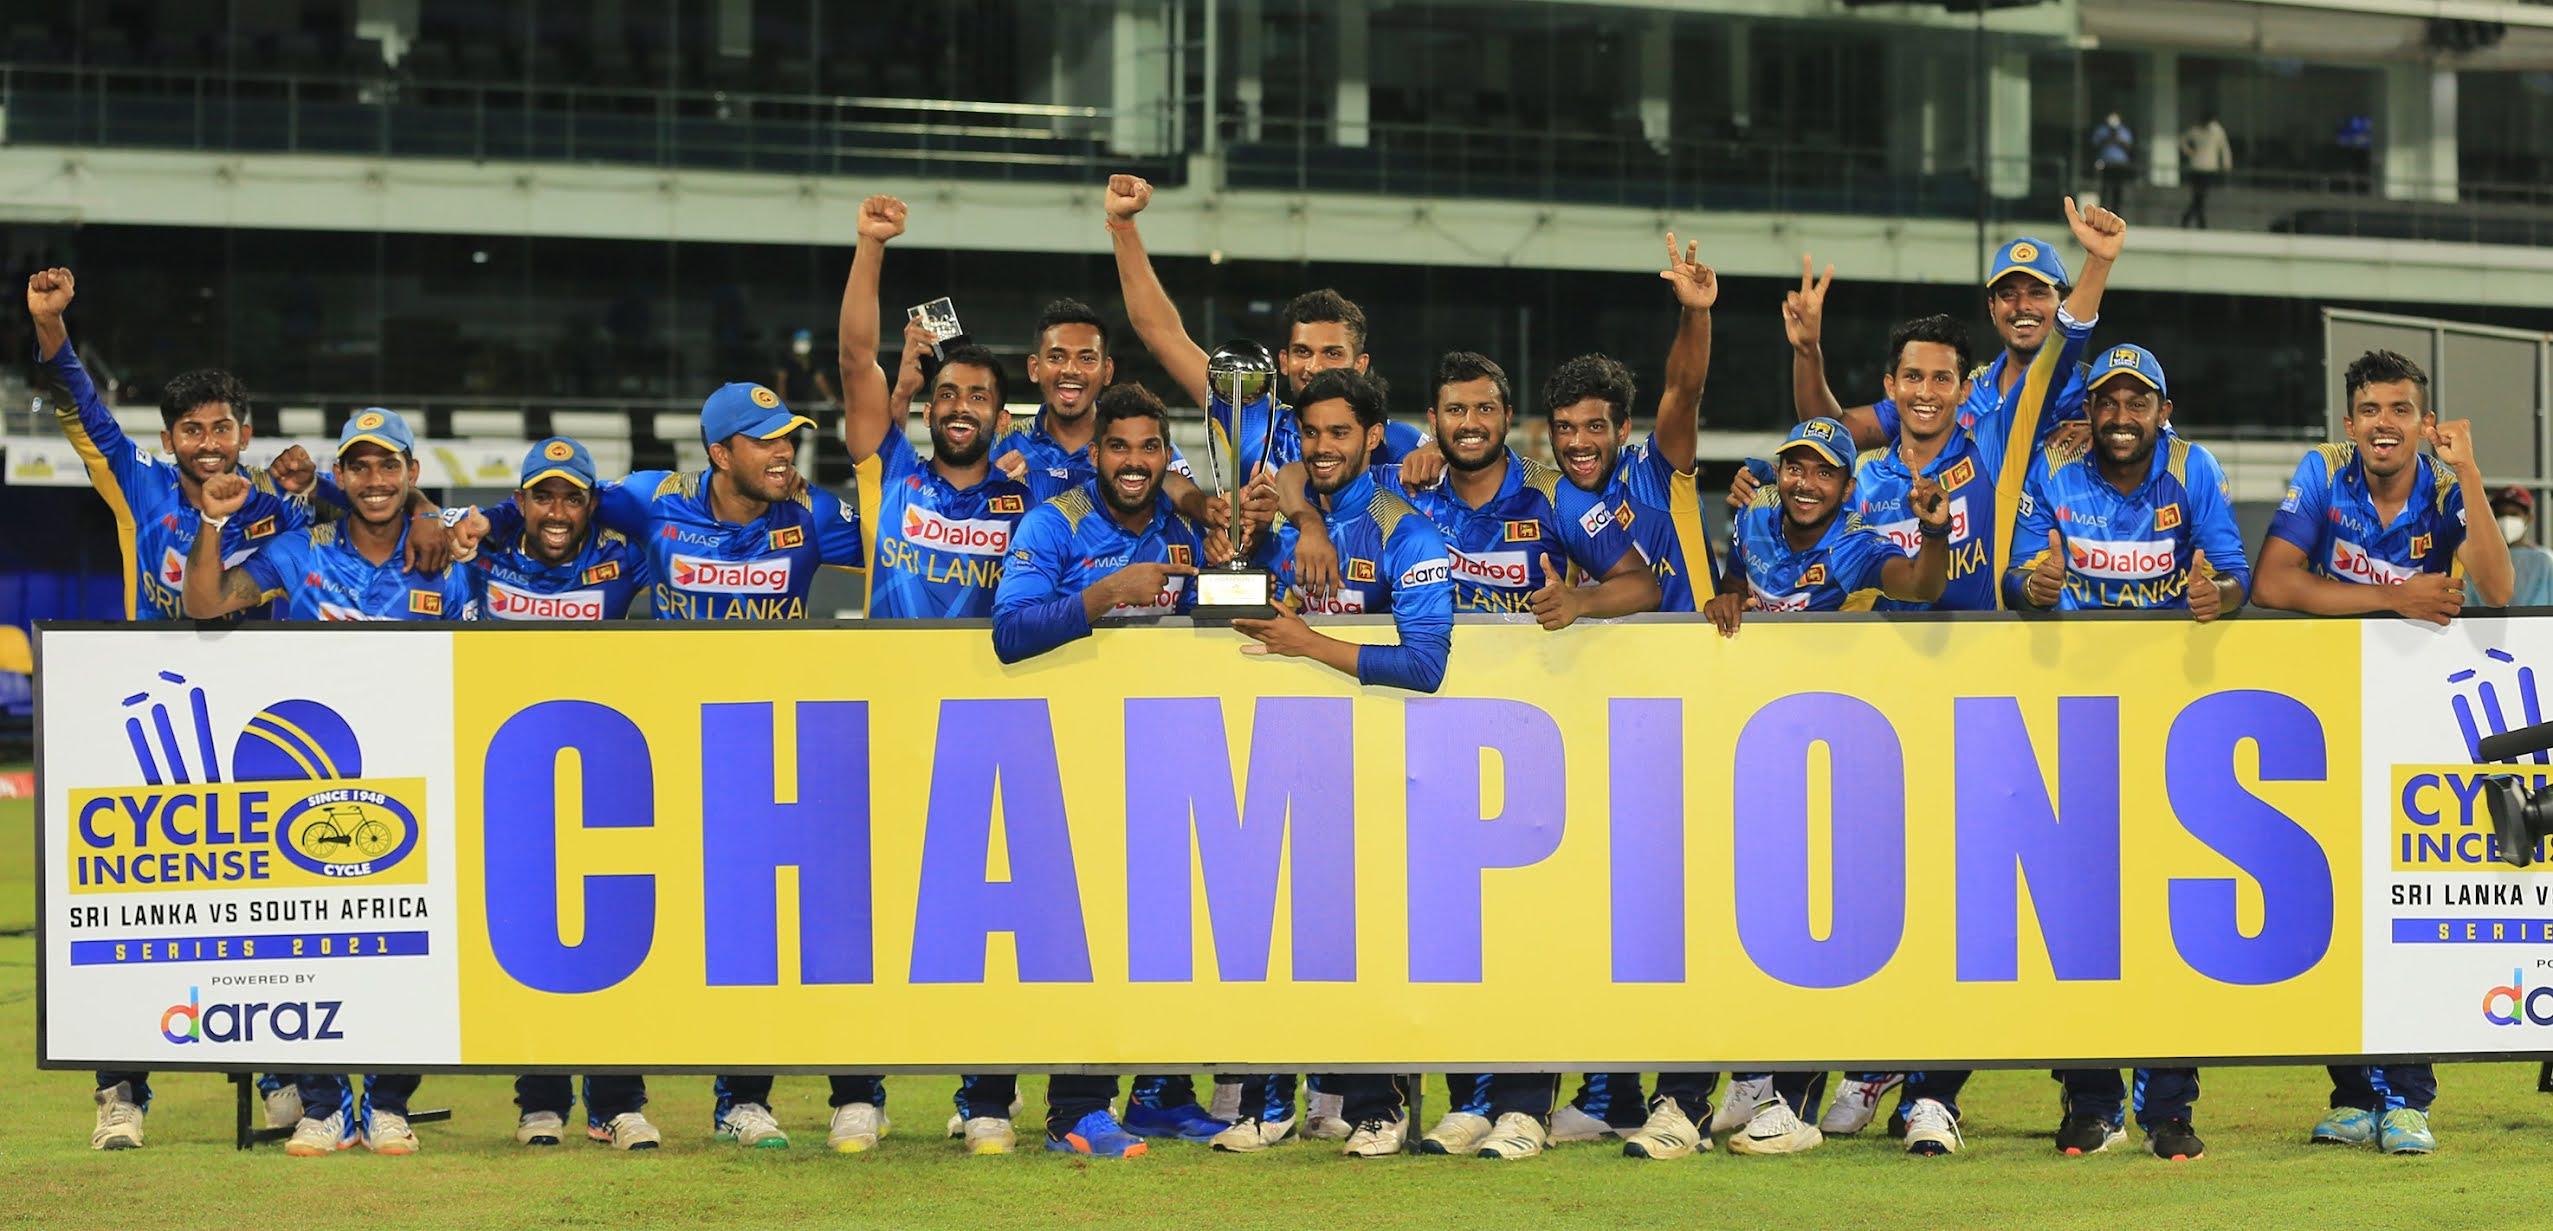 Sri lanka won the ODI cricket series